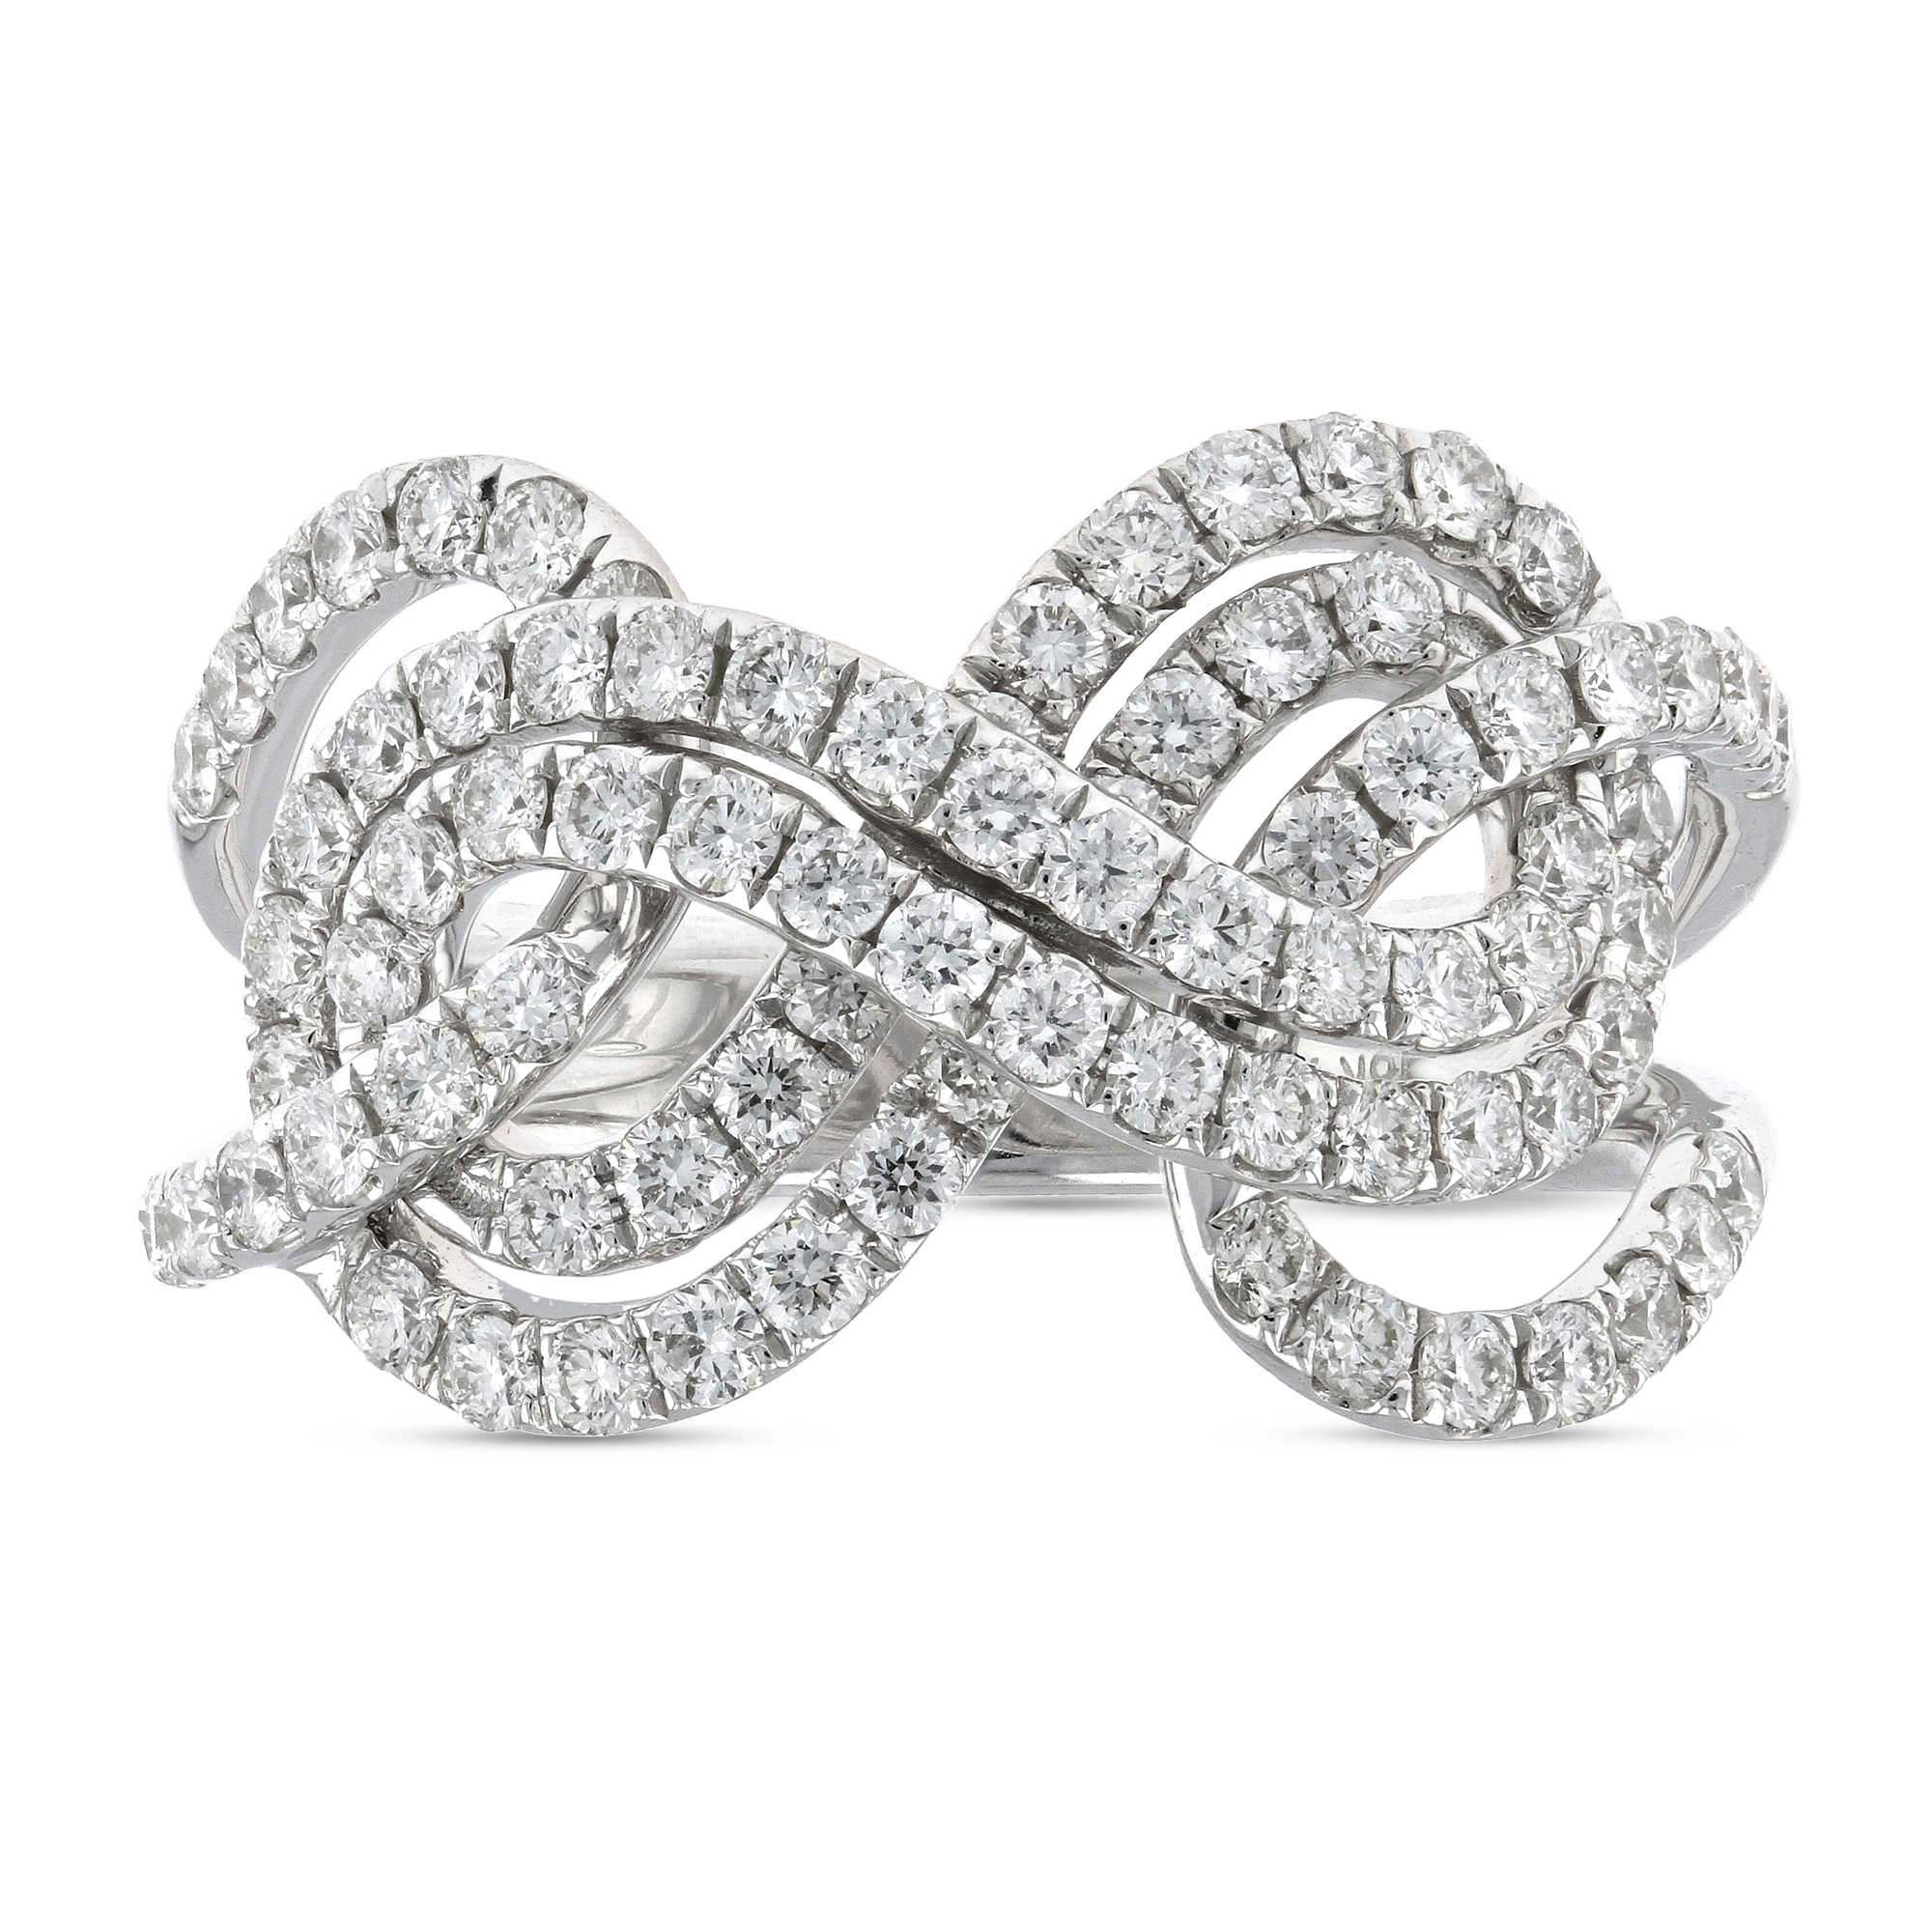 View 1.20ctw Diamond Fashion ring in 18k White Gold